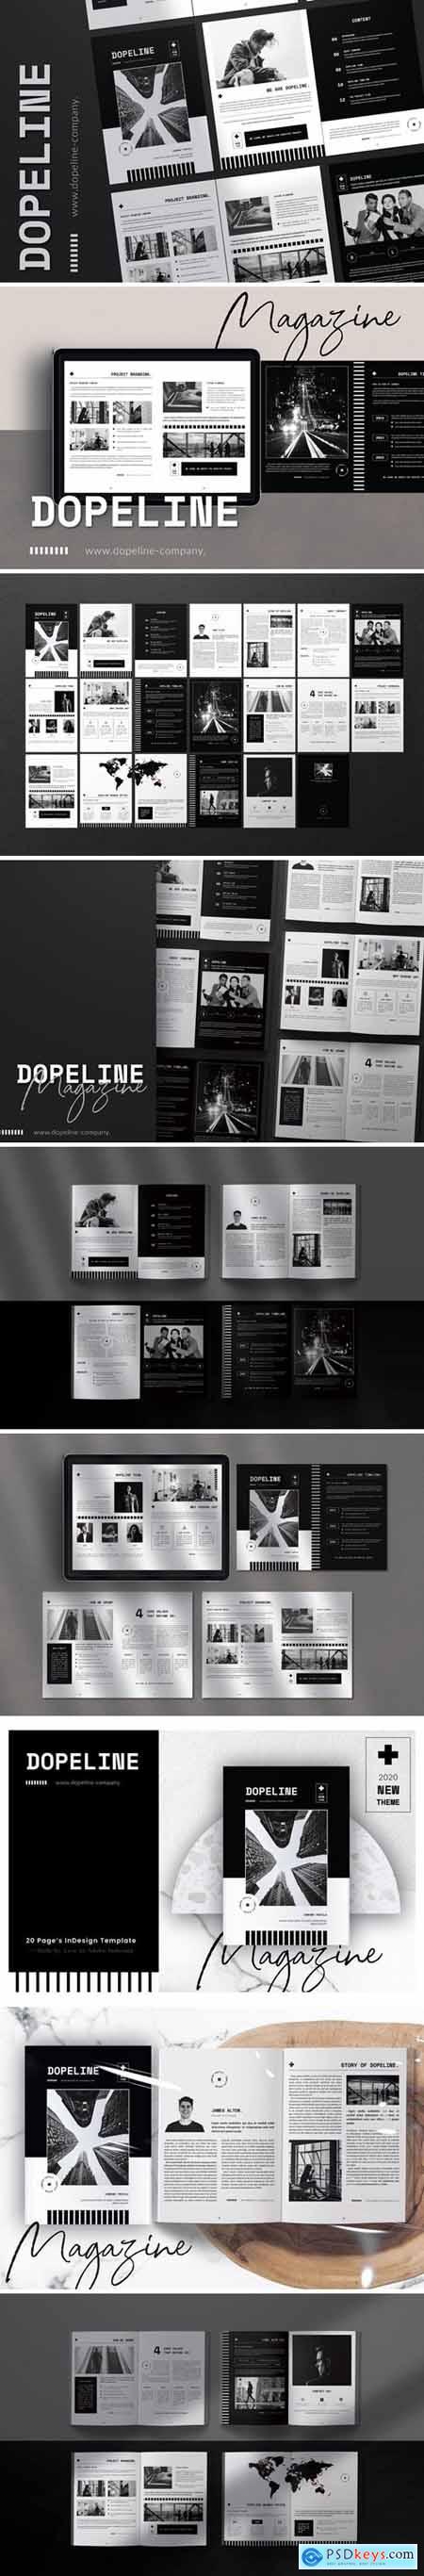 Company Profile Magazine